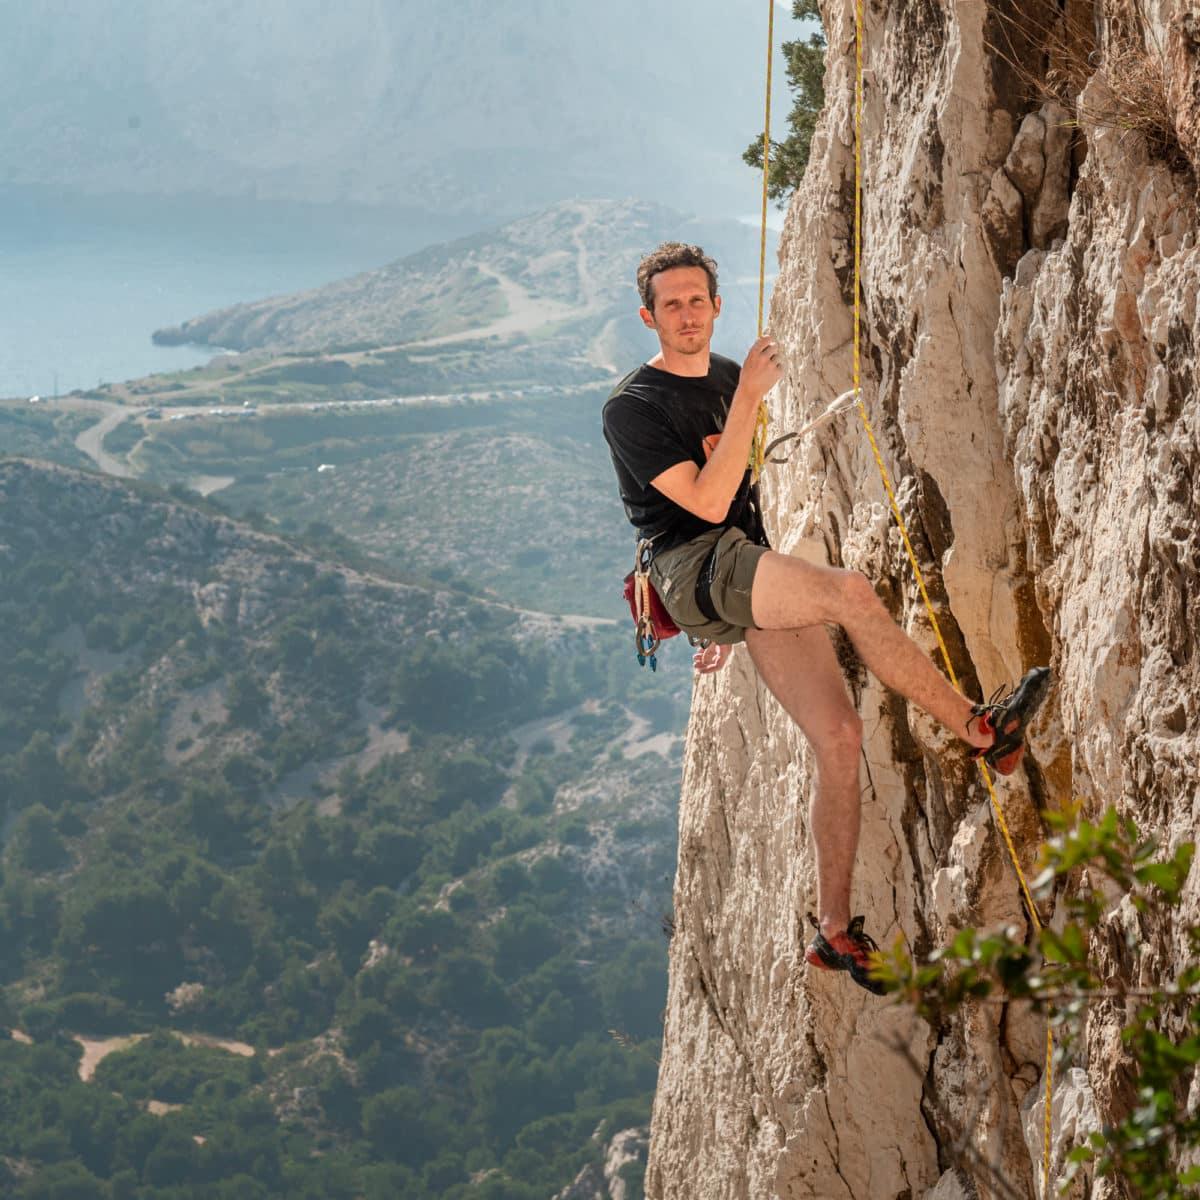 khaki shorts for climbing